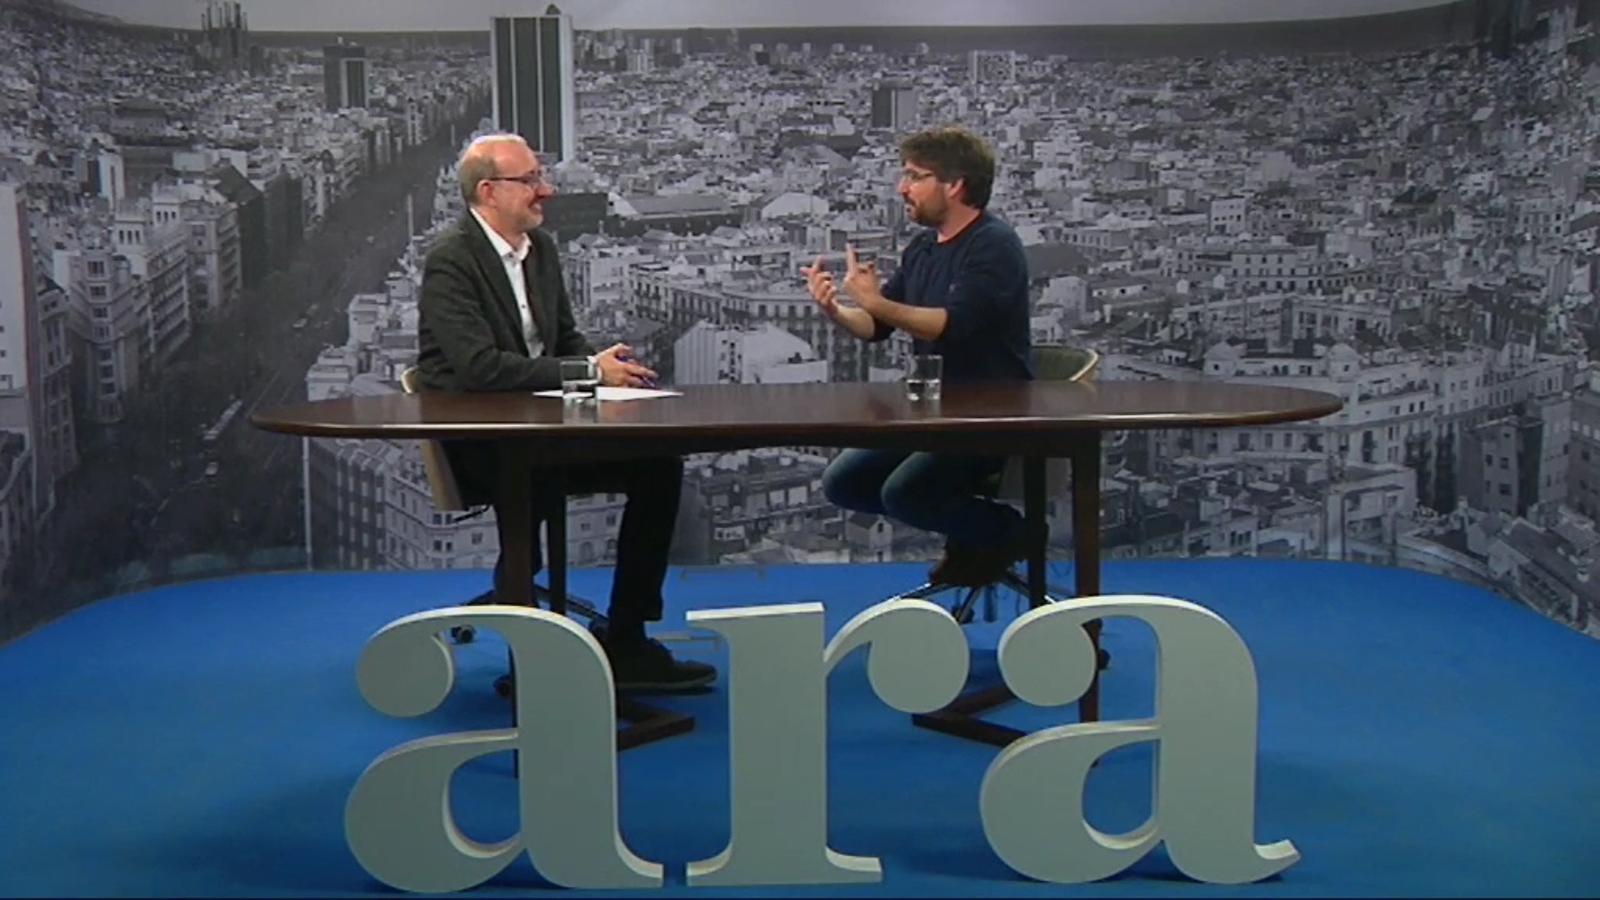 L'entrevista d'Antoni Bassas a Jordi Évole